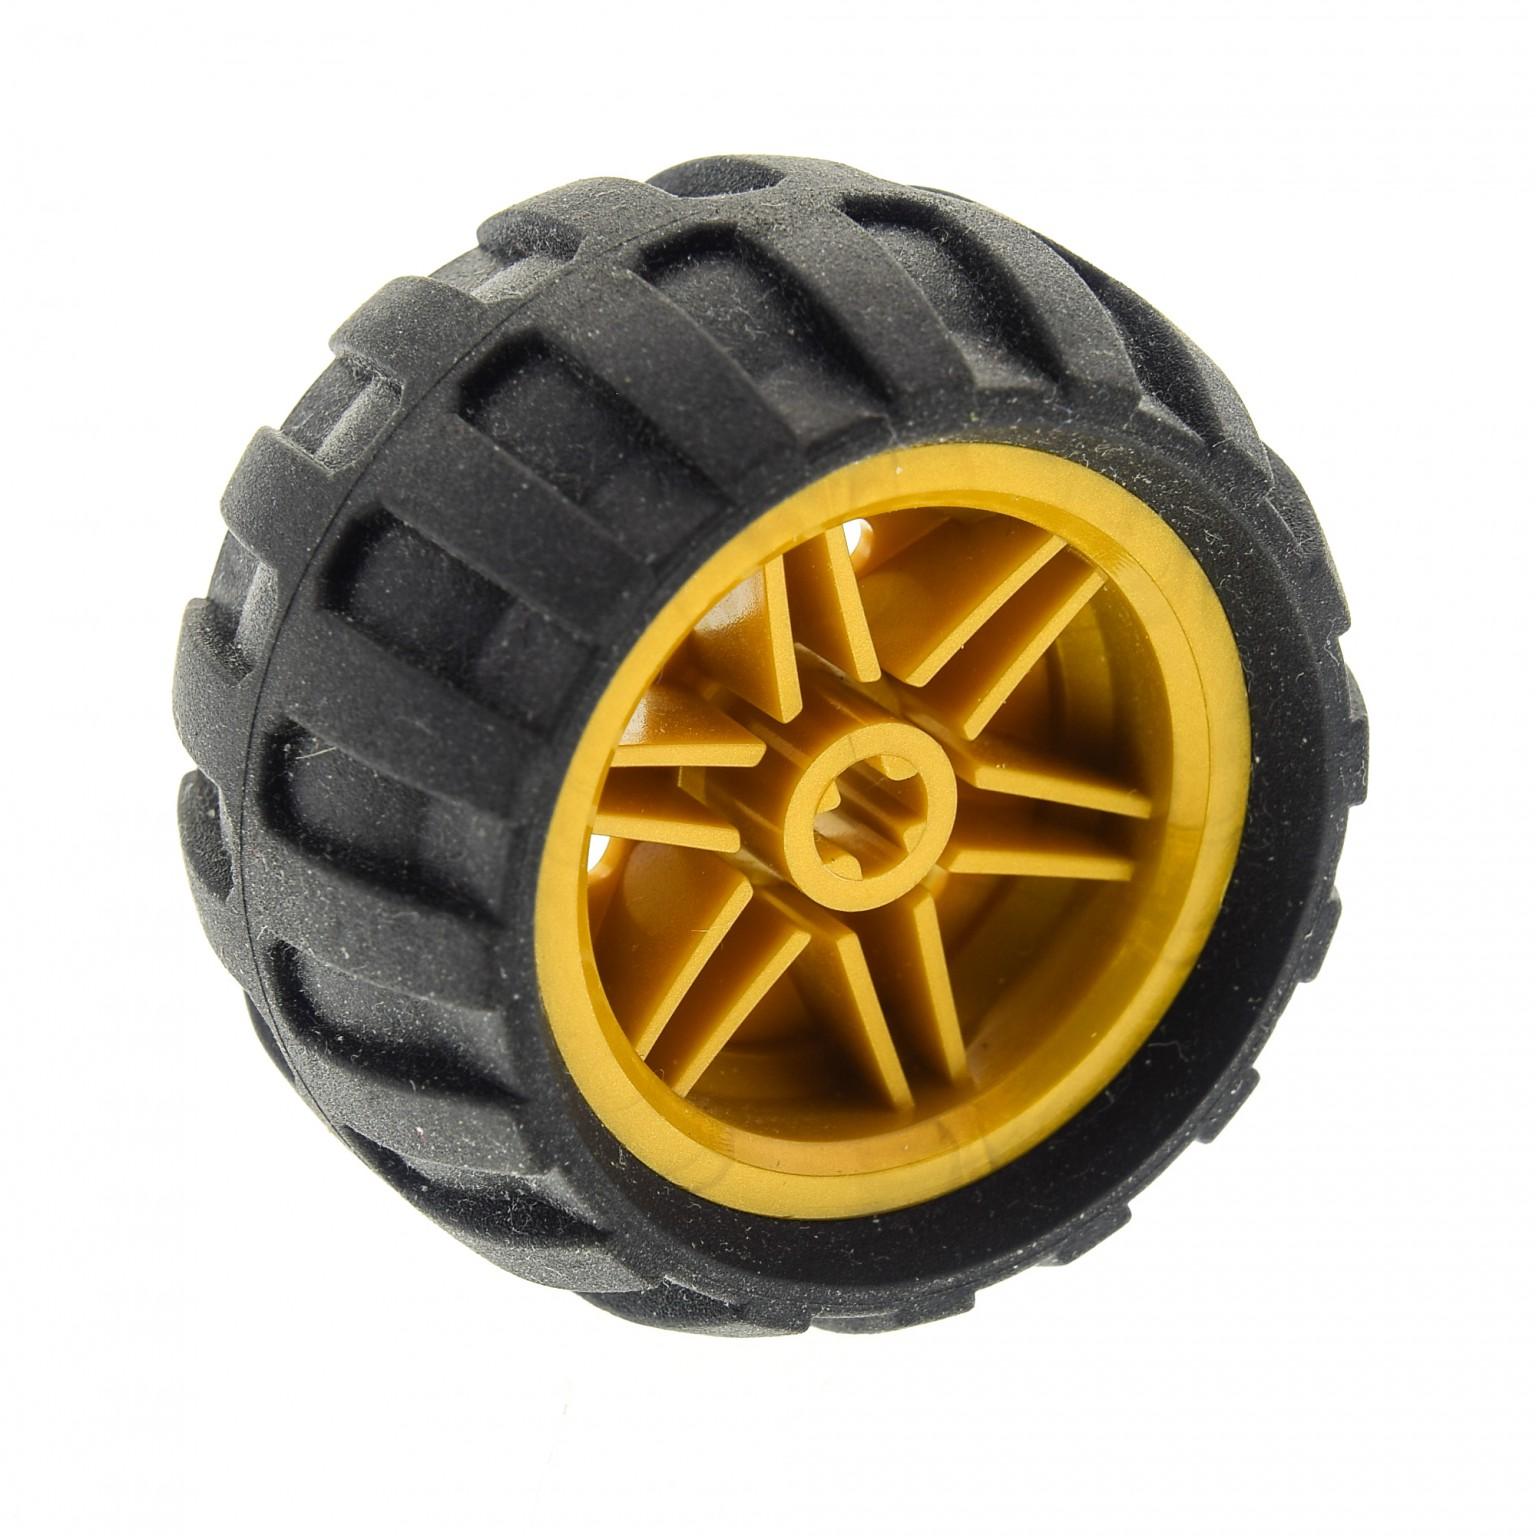 1x Lego Technic Rad 43.2x26 Felge gelb 30.4x20 Ballon Reifen 61481 56145c04